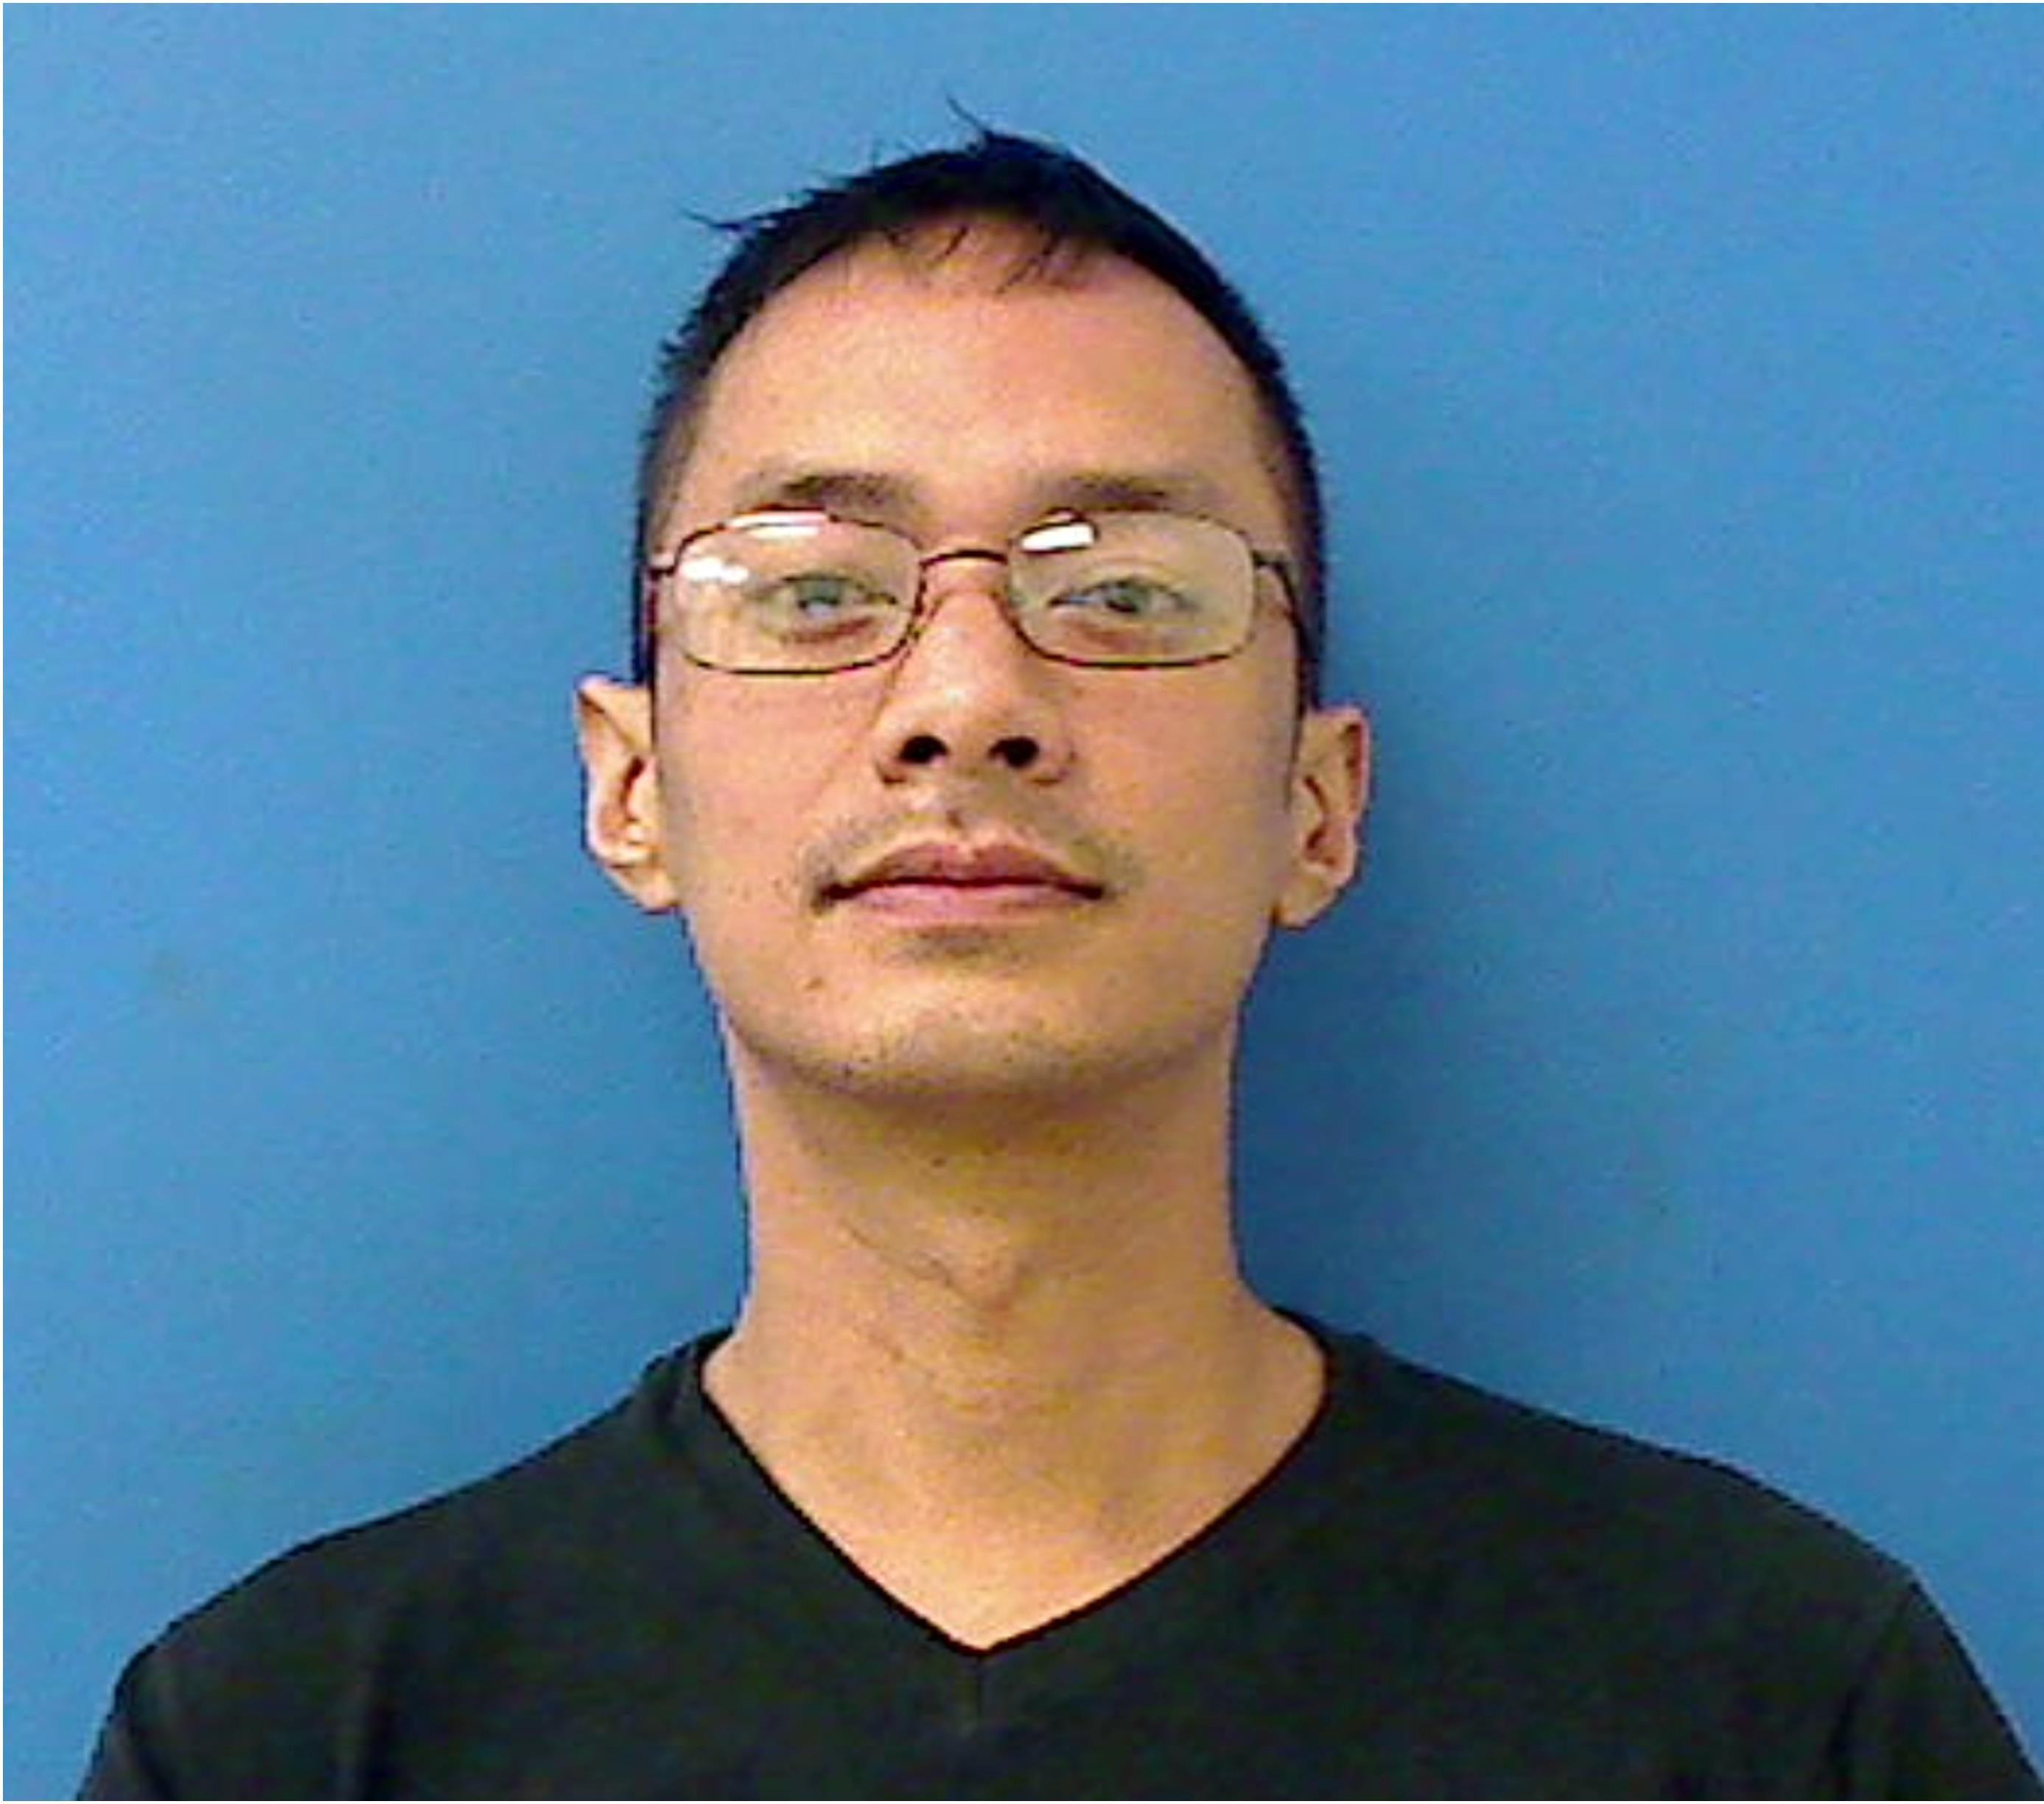 Defendant Henry Pham